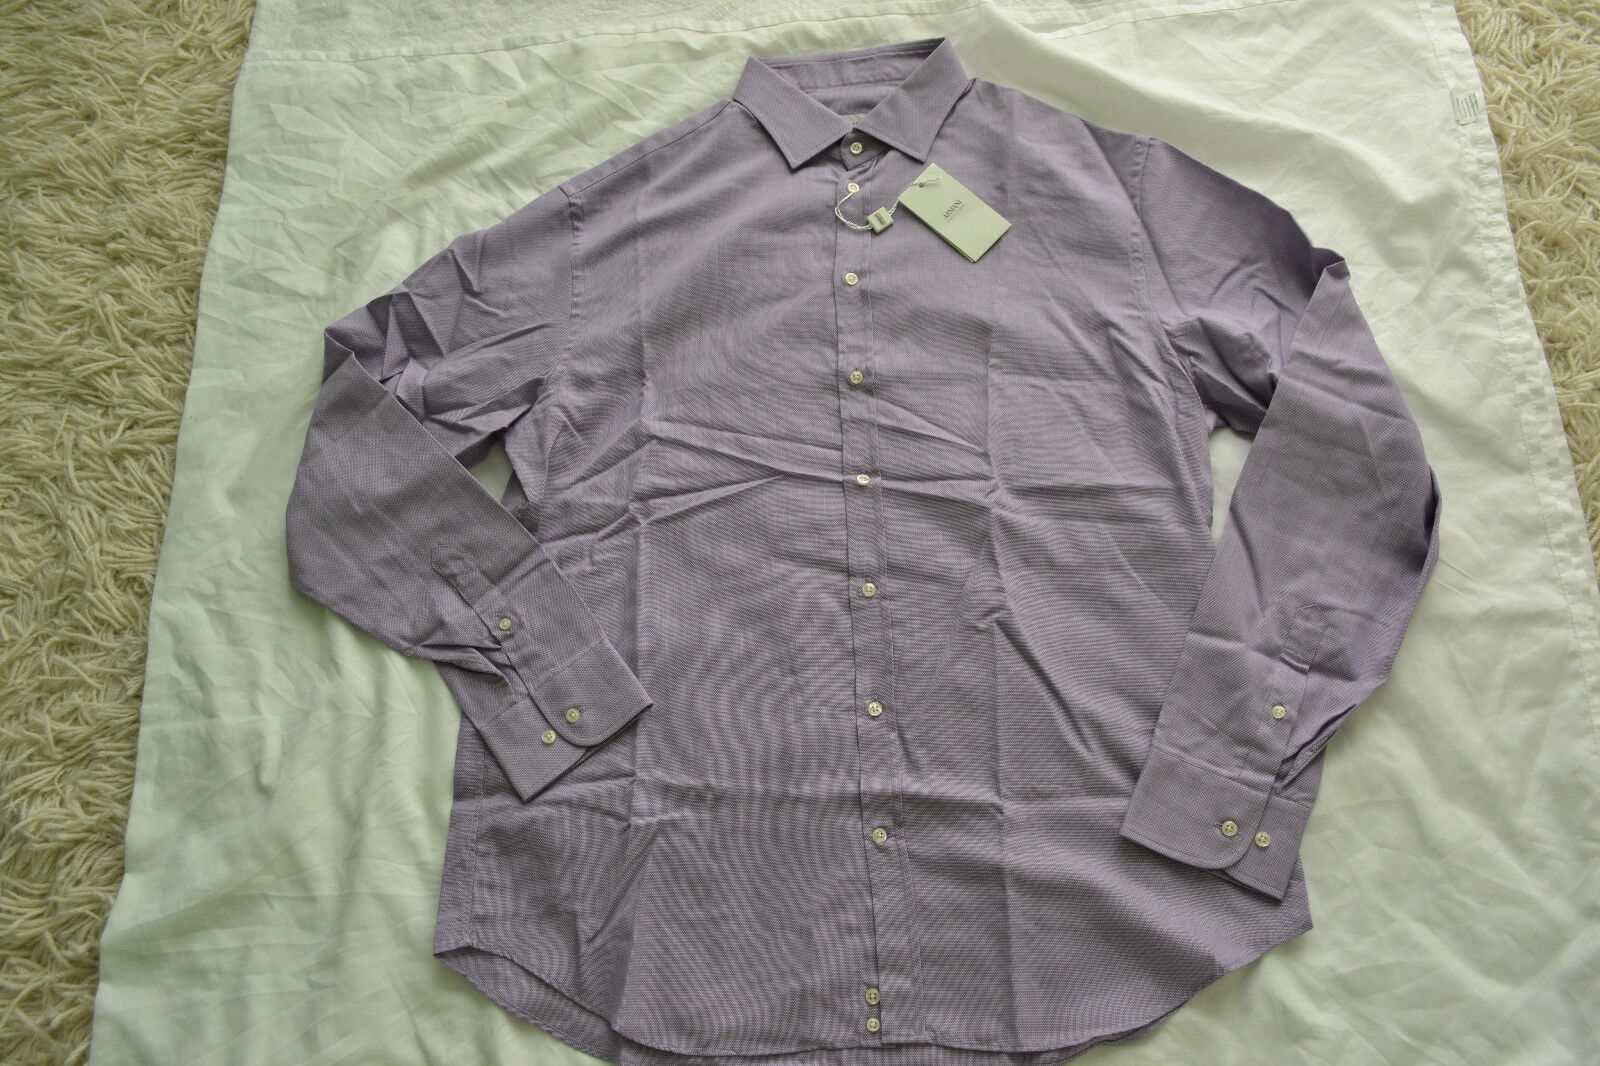 ARMANI COLLEZIONI SHIRT IN MICRO FANCY WEAVE COTTON Size 43 17 Long Brand New